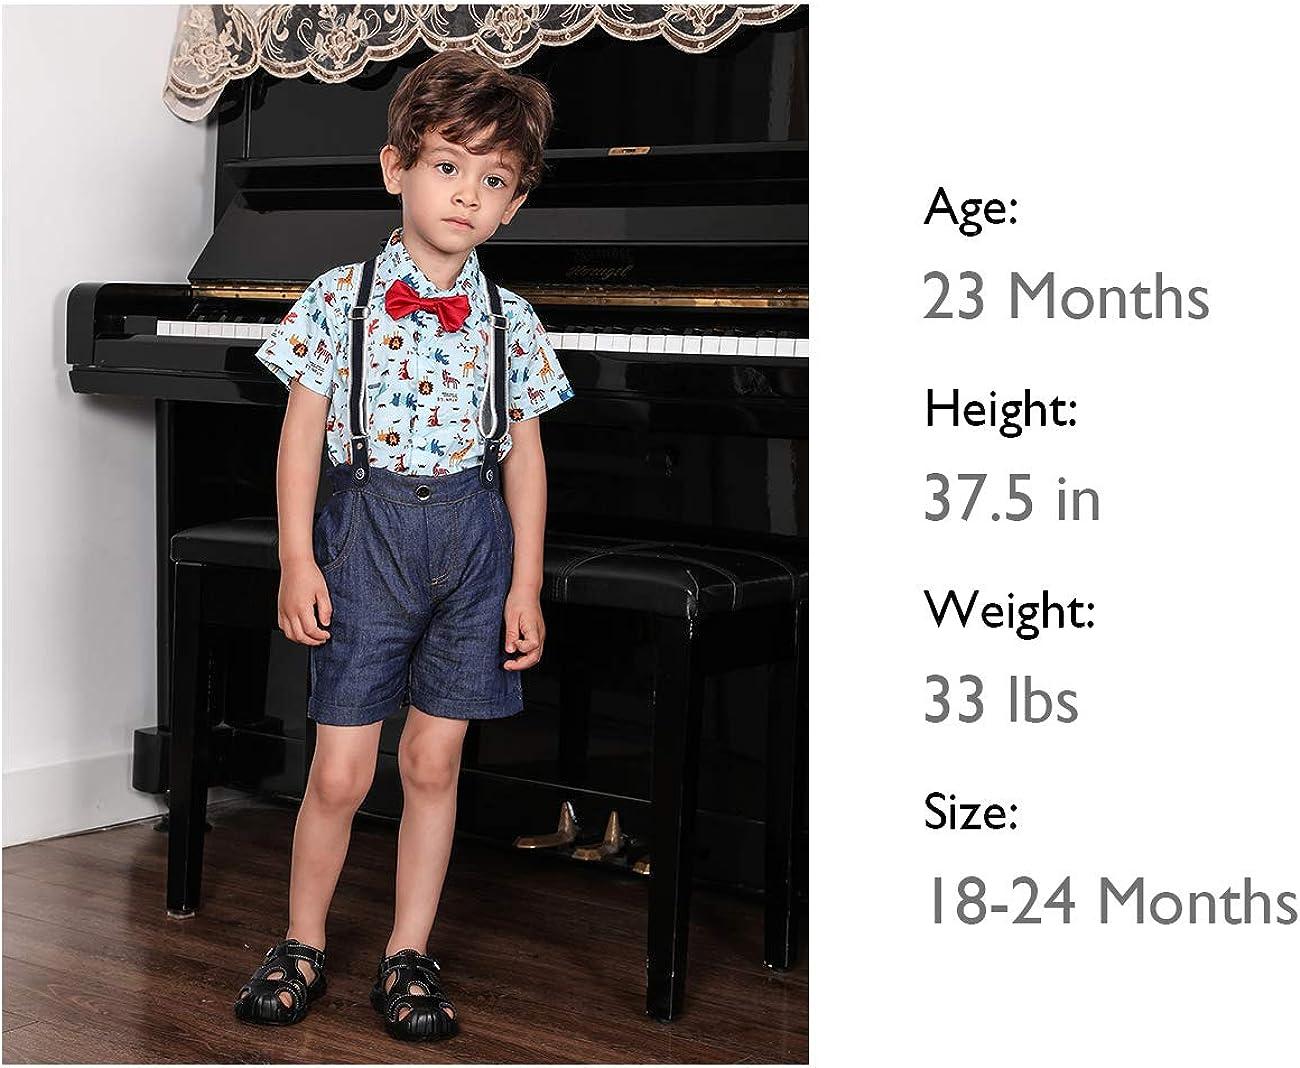 4 pcs, 0-5T HOSUKKO Baby Boy Clothes Outfit Onesie /& Jeans /& Bow Tie /& Suspenders Infant Boys Pants Sets for Dress Up